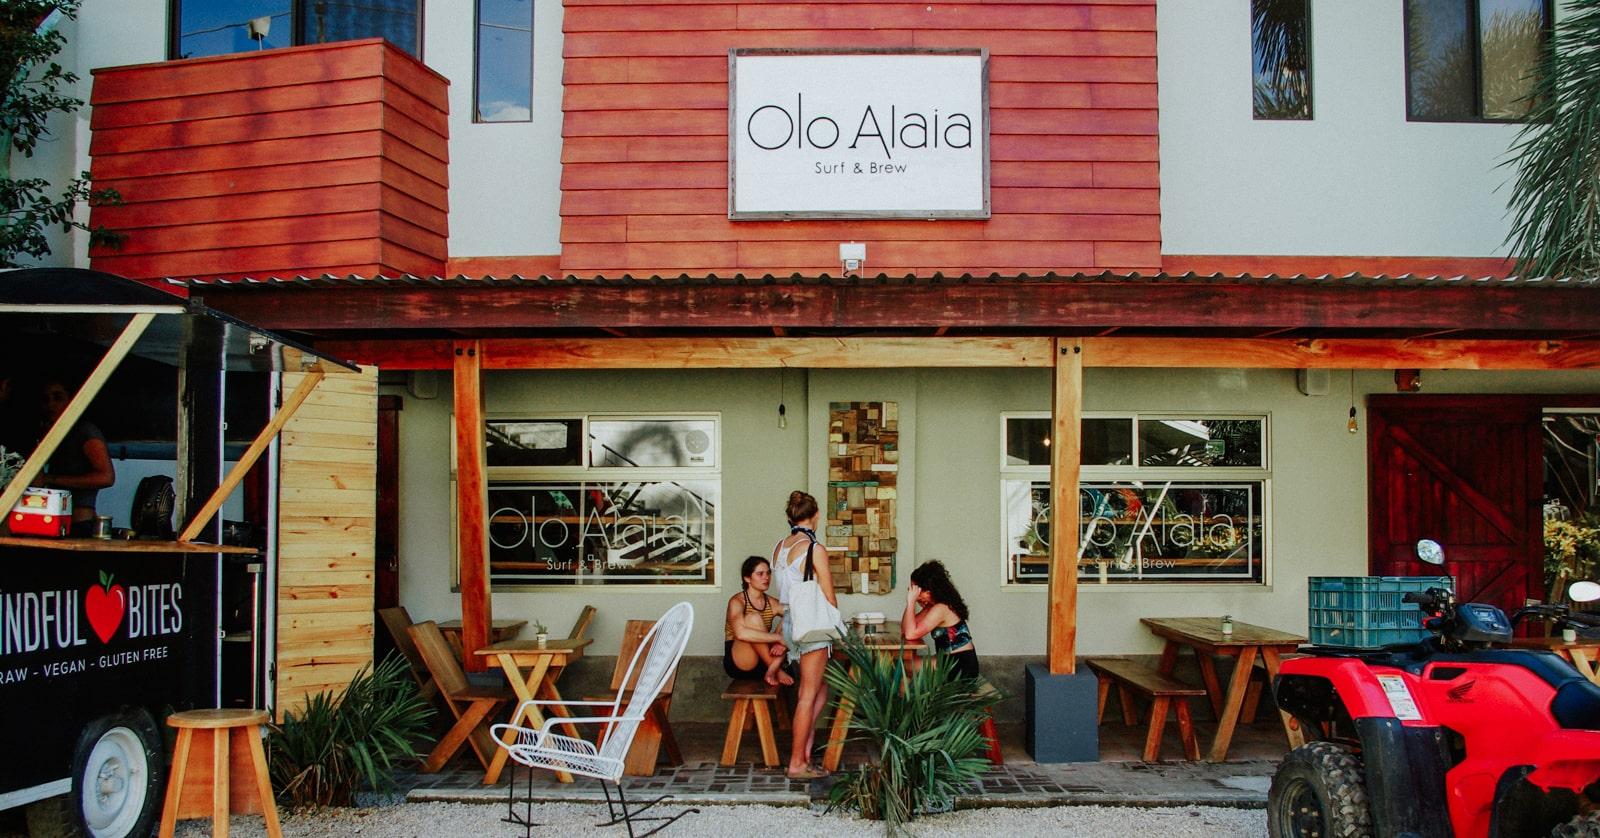 Surfboard hire in Nosara Costa Rica